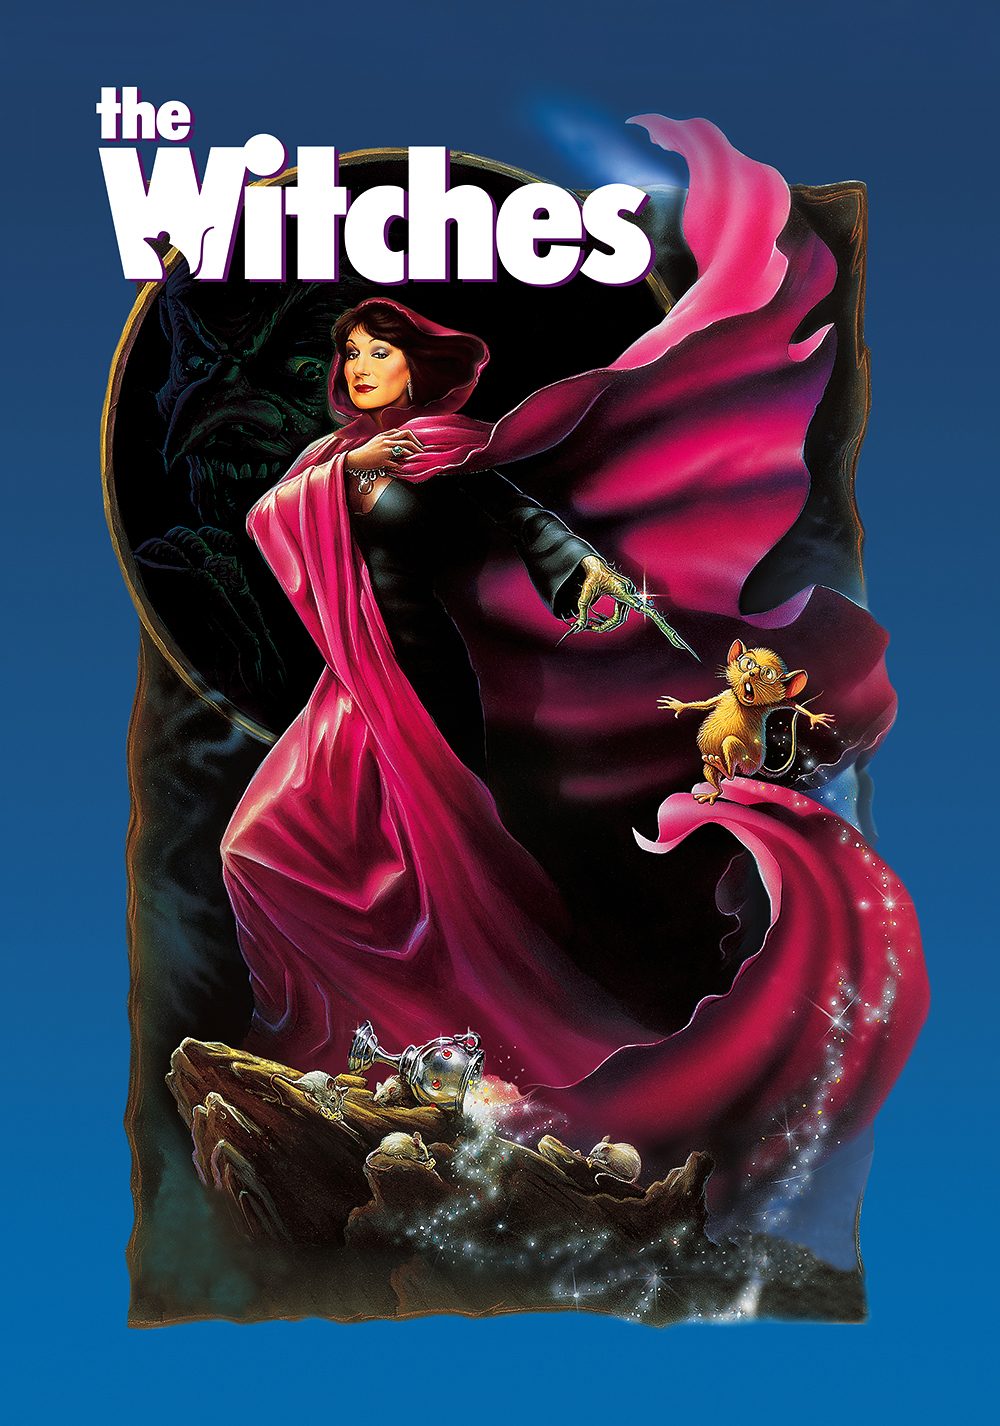 The Witches [1990] [DVDR] [NTSC] [Subtitulado]